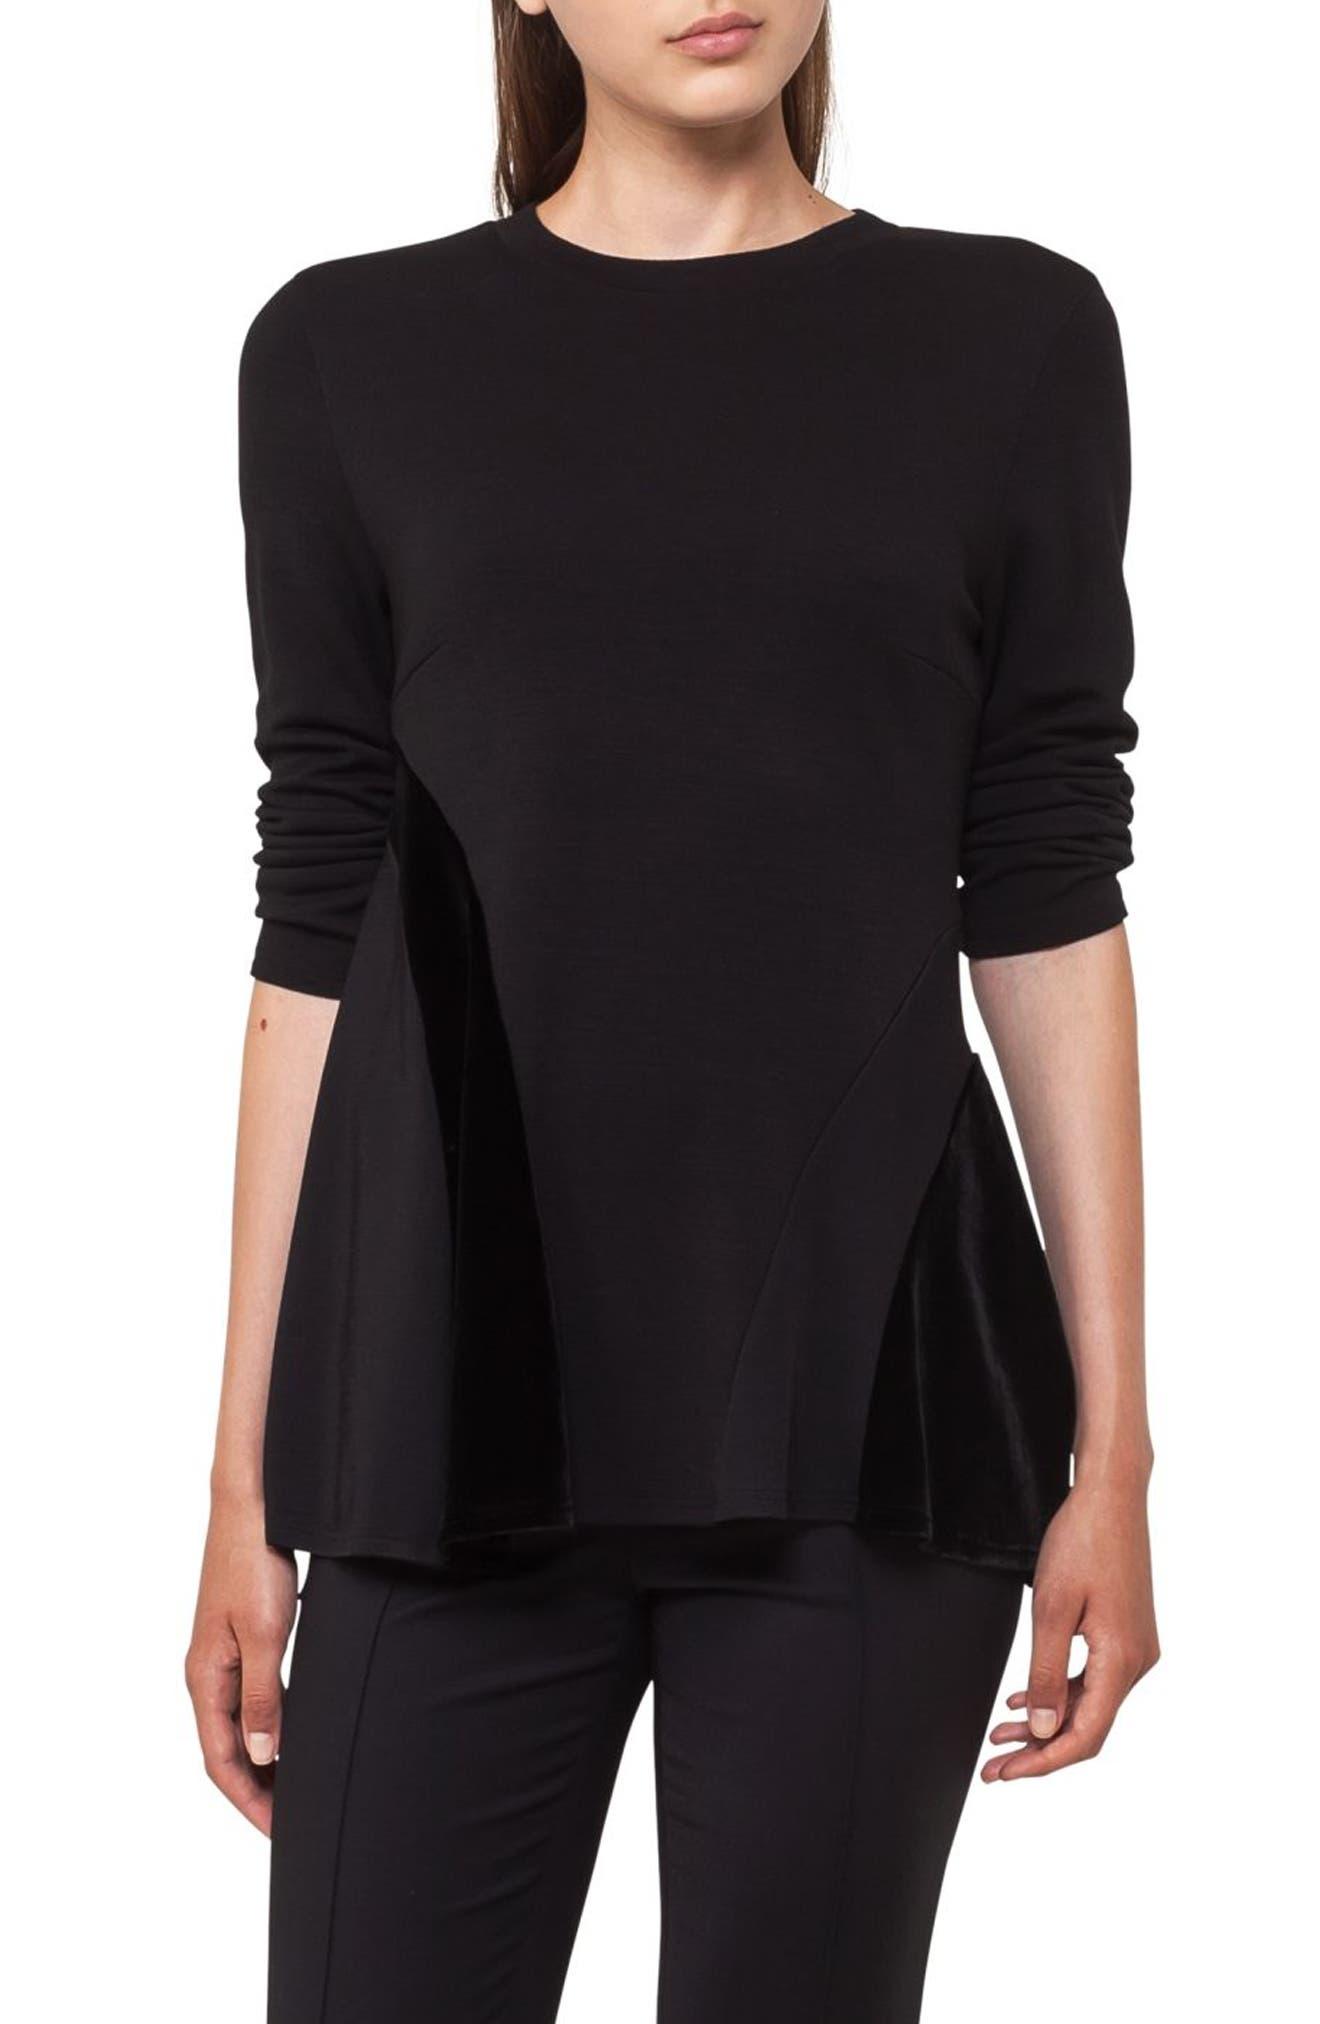 Quad Circle Sweatshirt,                             Main thumbnail 1, color,                             Black